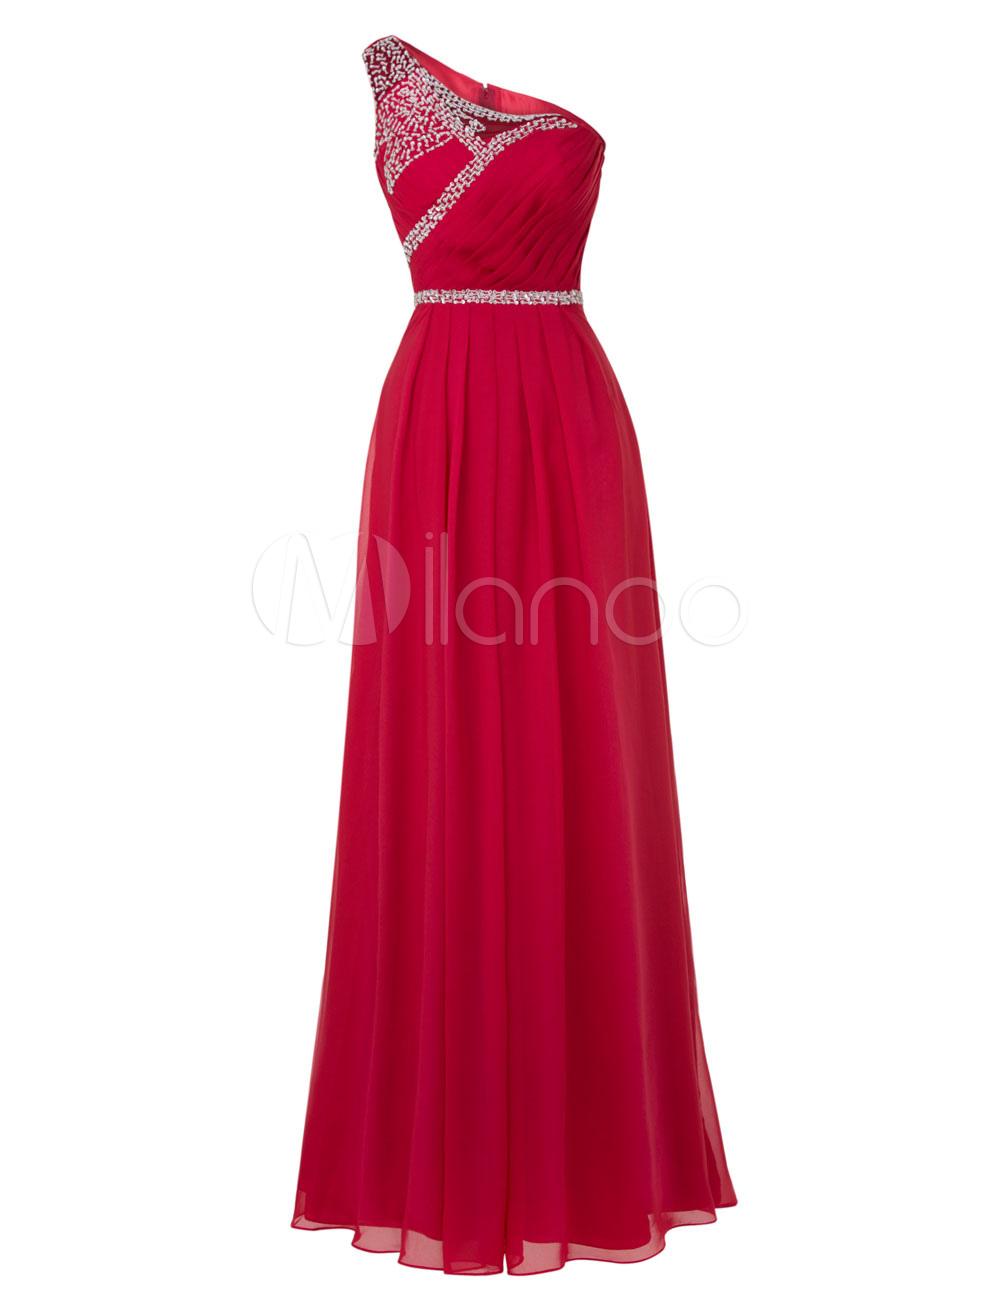 Long Prom Dresses 2018 Pastel Blue One Shoulder Bridesmaid Dress Chiffon Beading Floor Length Party Dresses (Wedding) photo